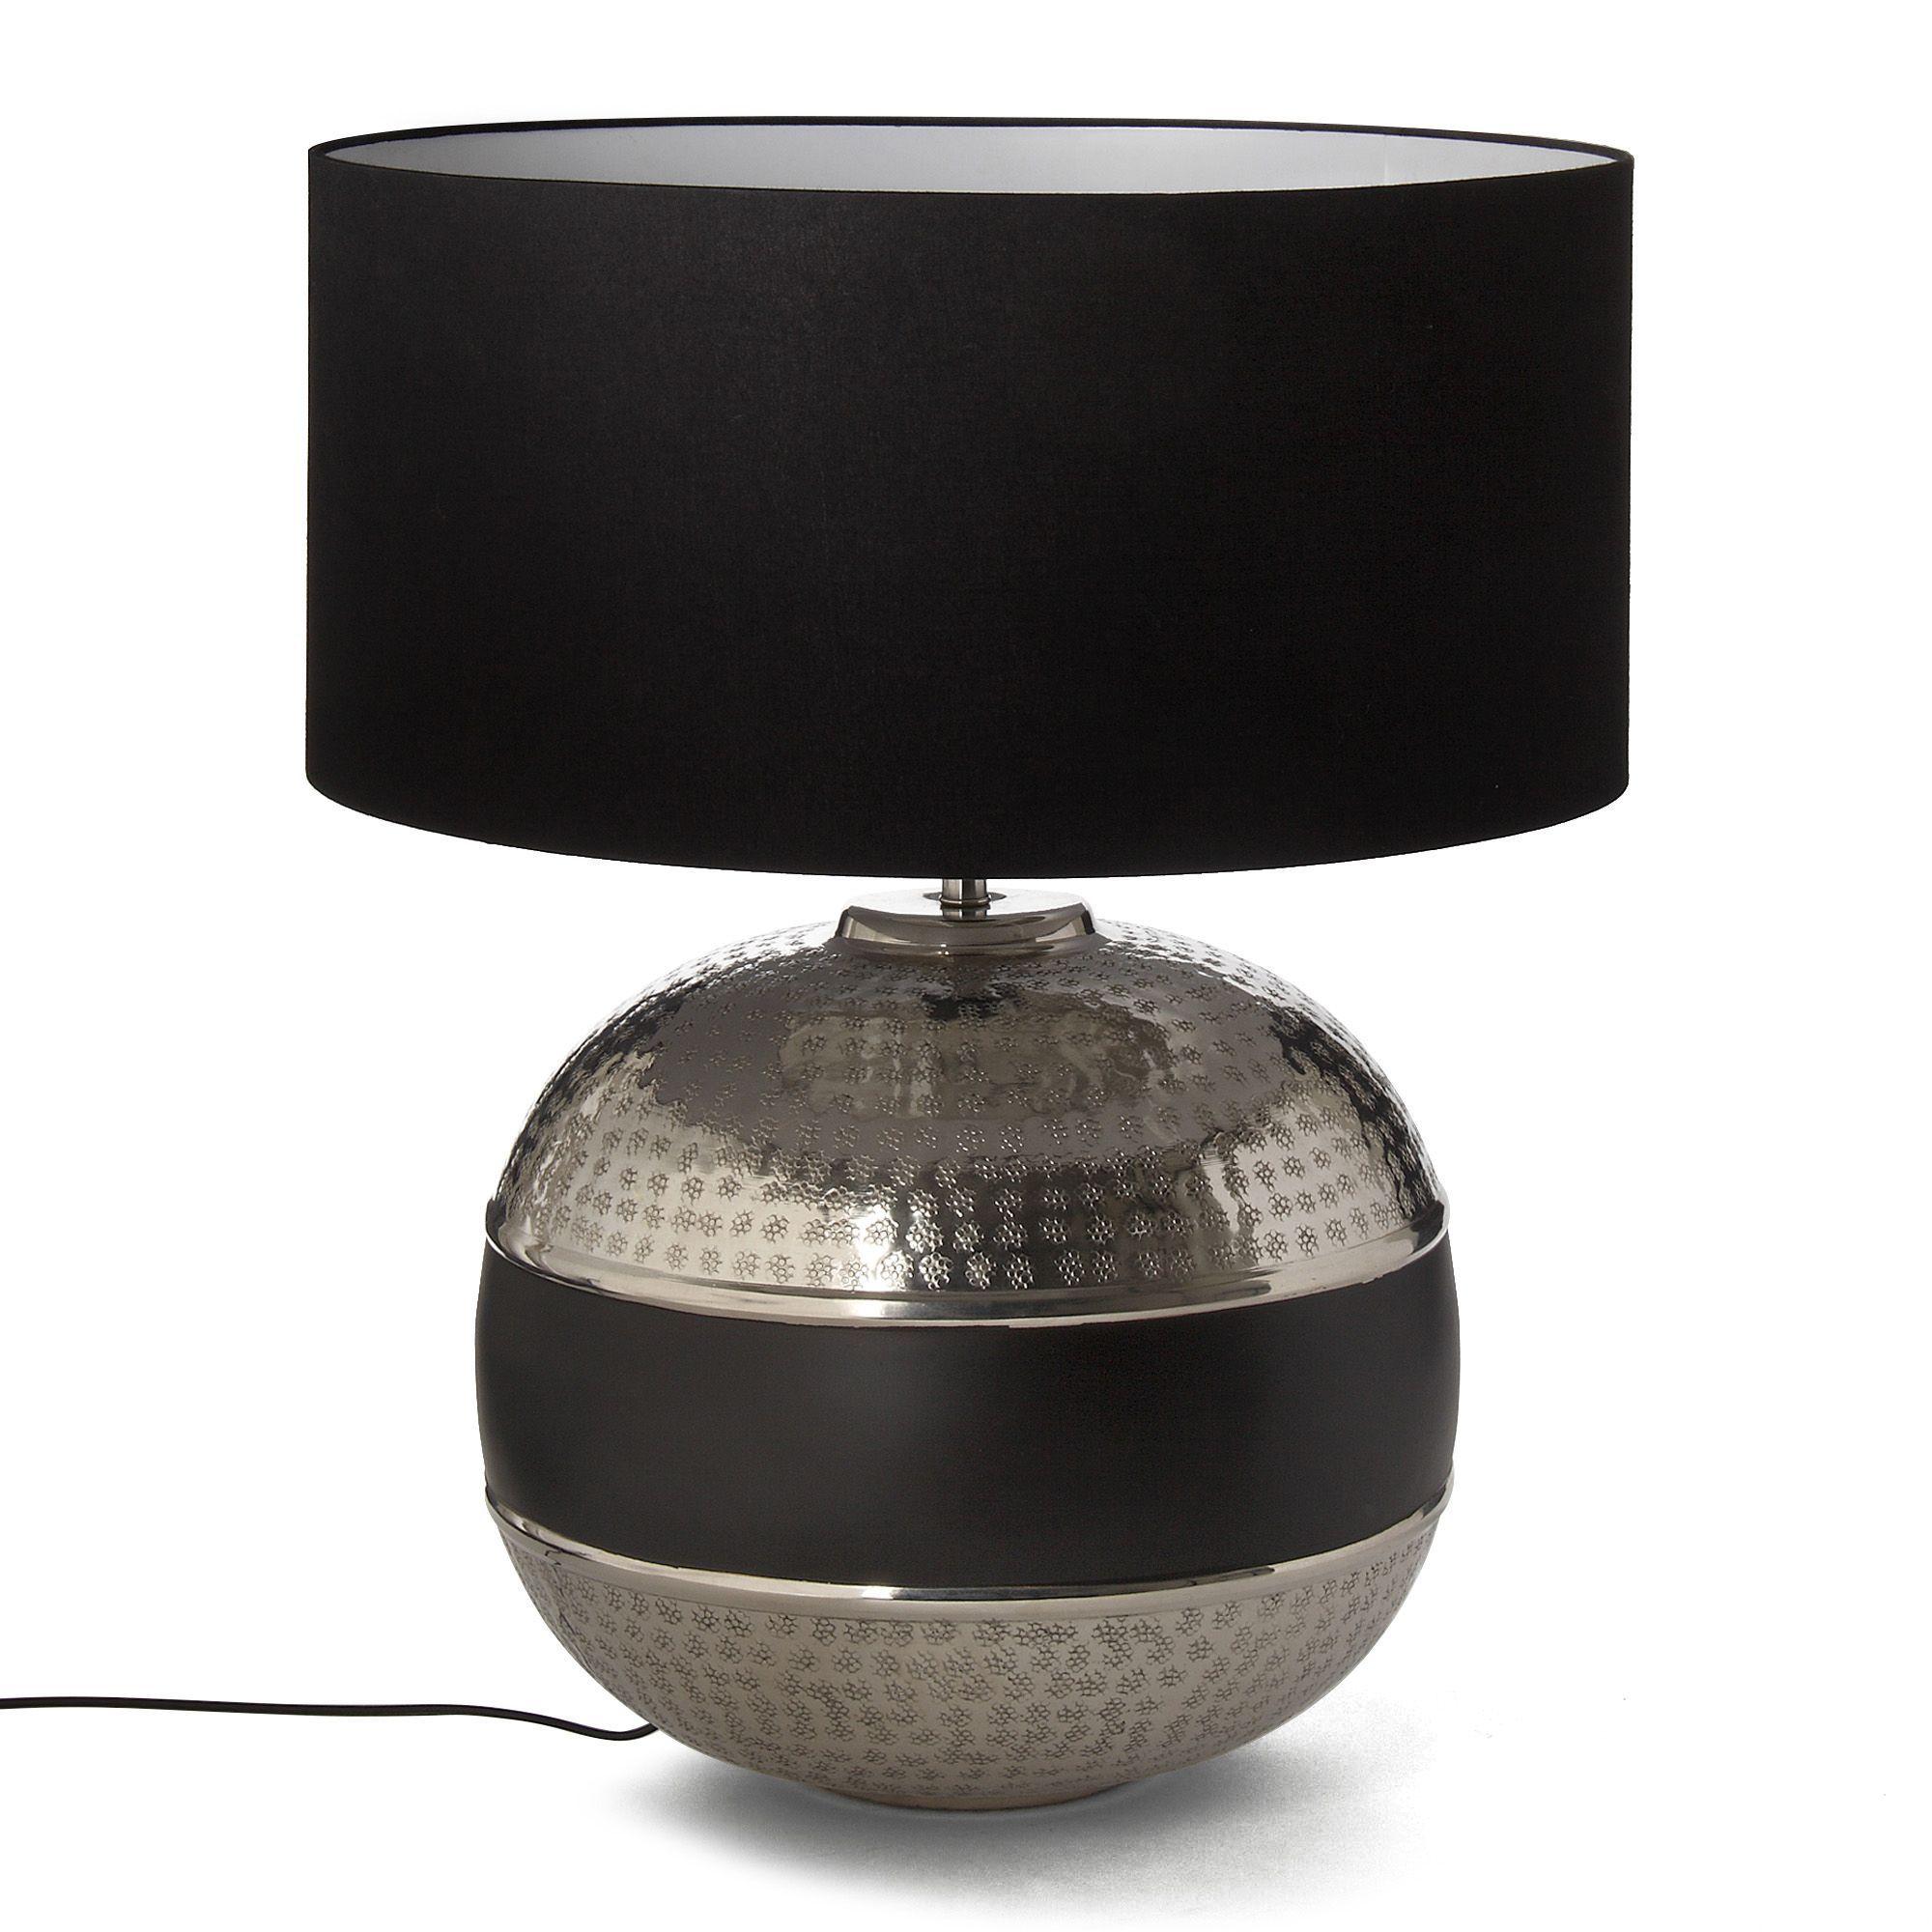 lampe avec abat jour alu noir h56cm mahara les lampes. Black Bedroom Furniture Sets. Home Design Ideas